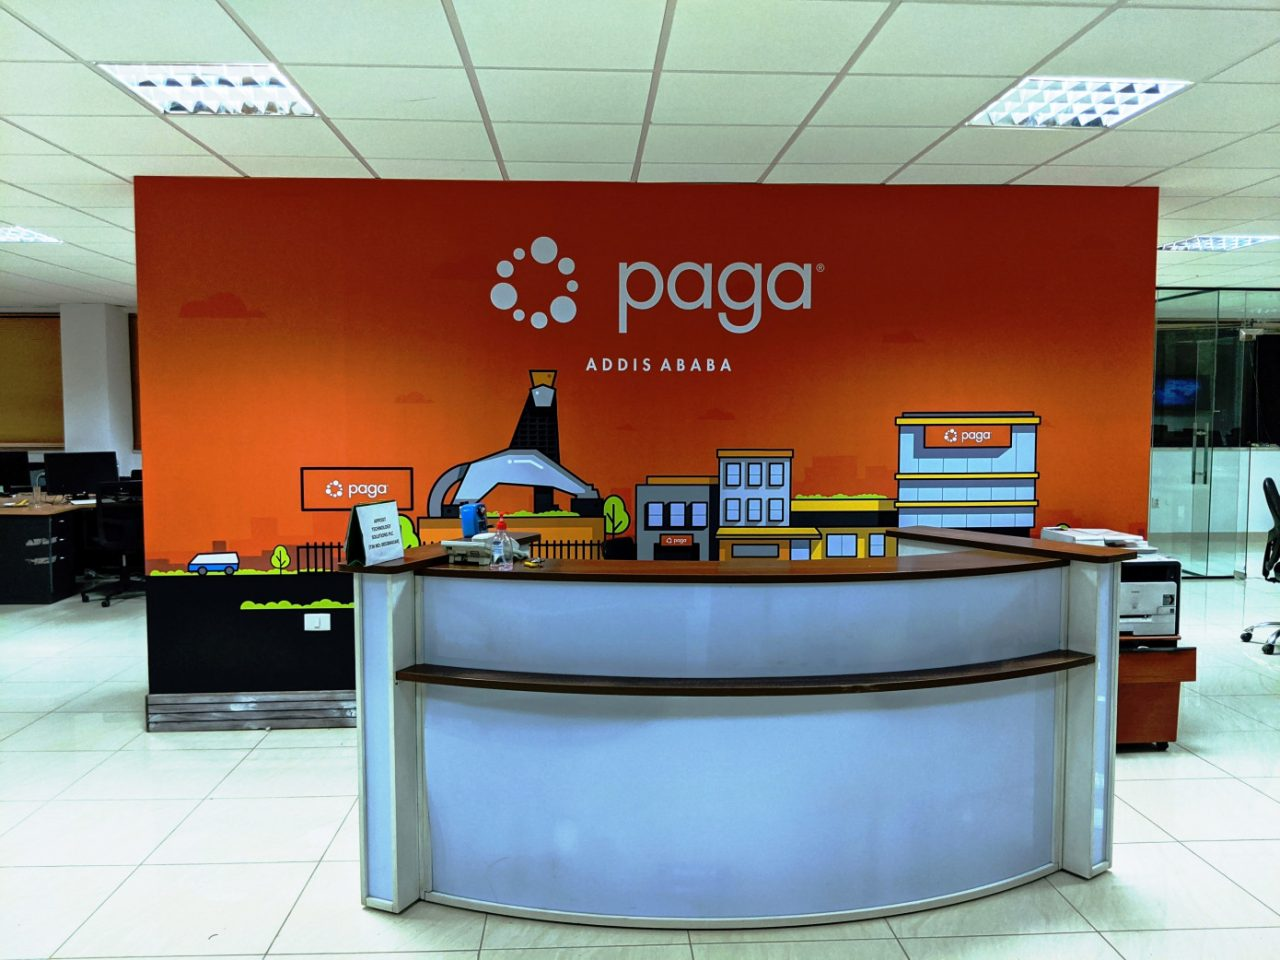 Paga-Nigeria-Ethiopia-Office-1280x960.jpg